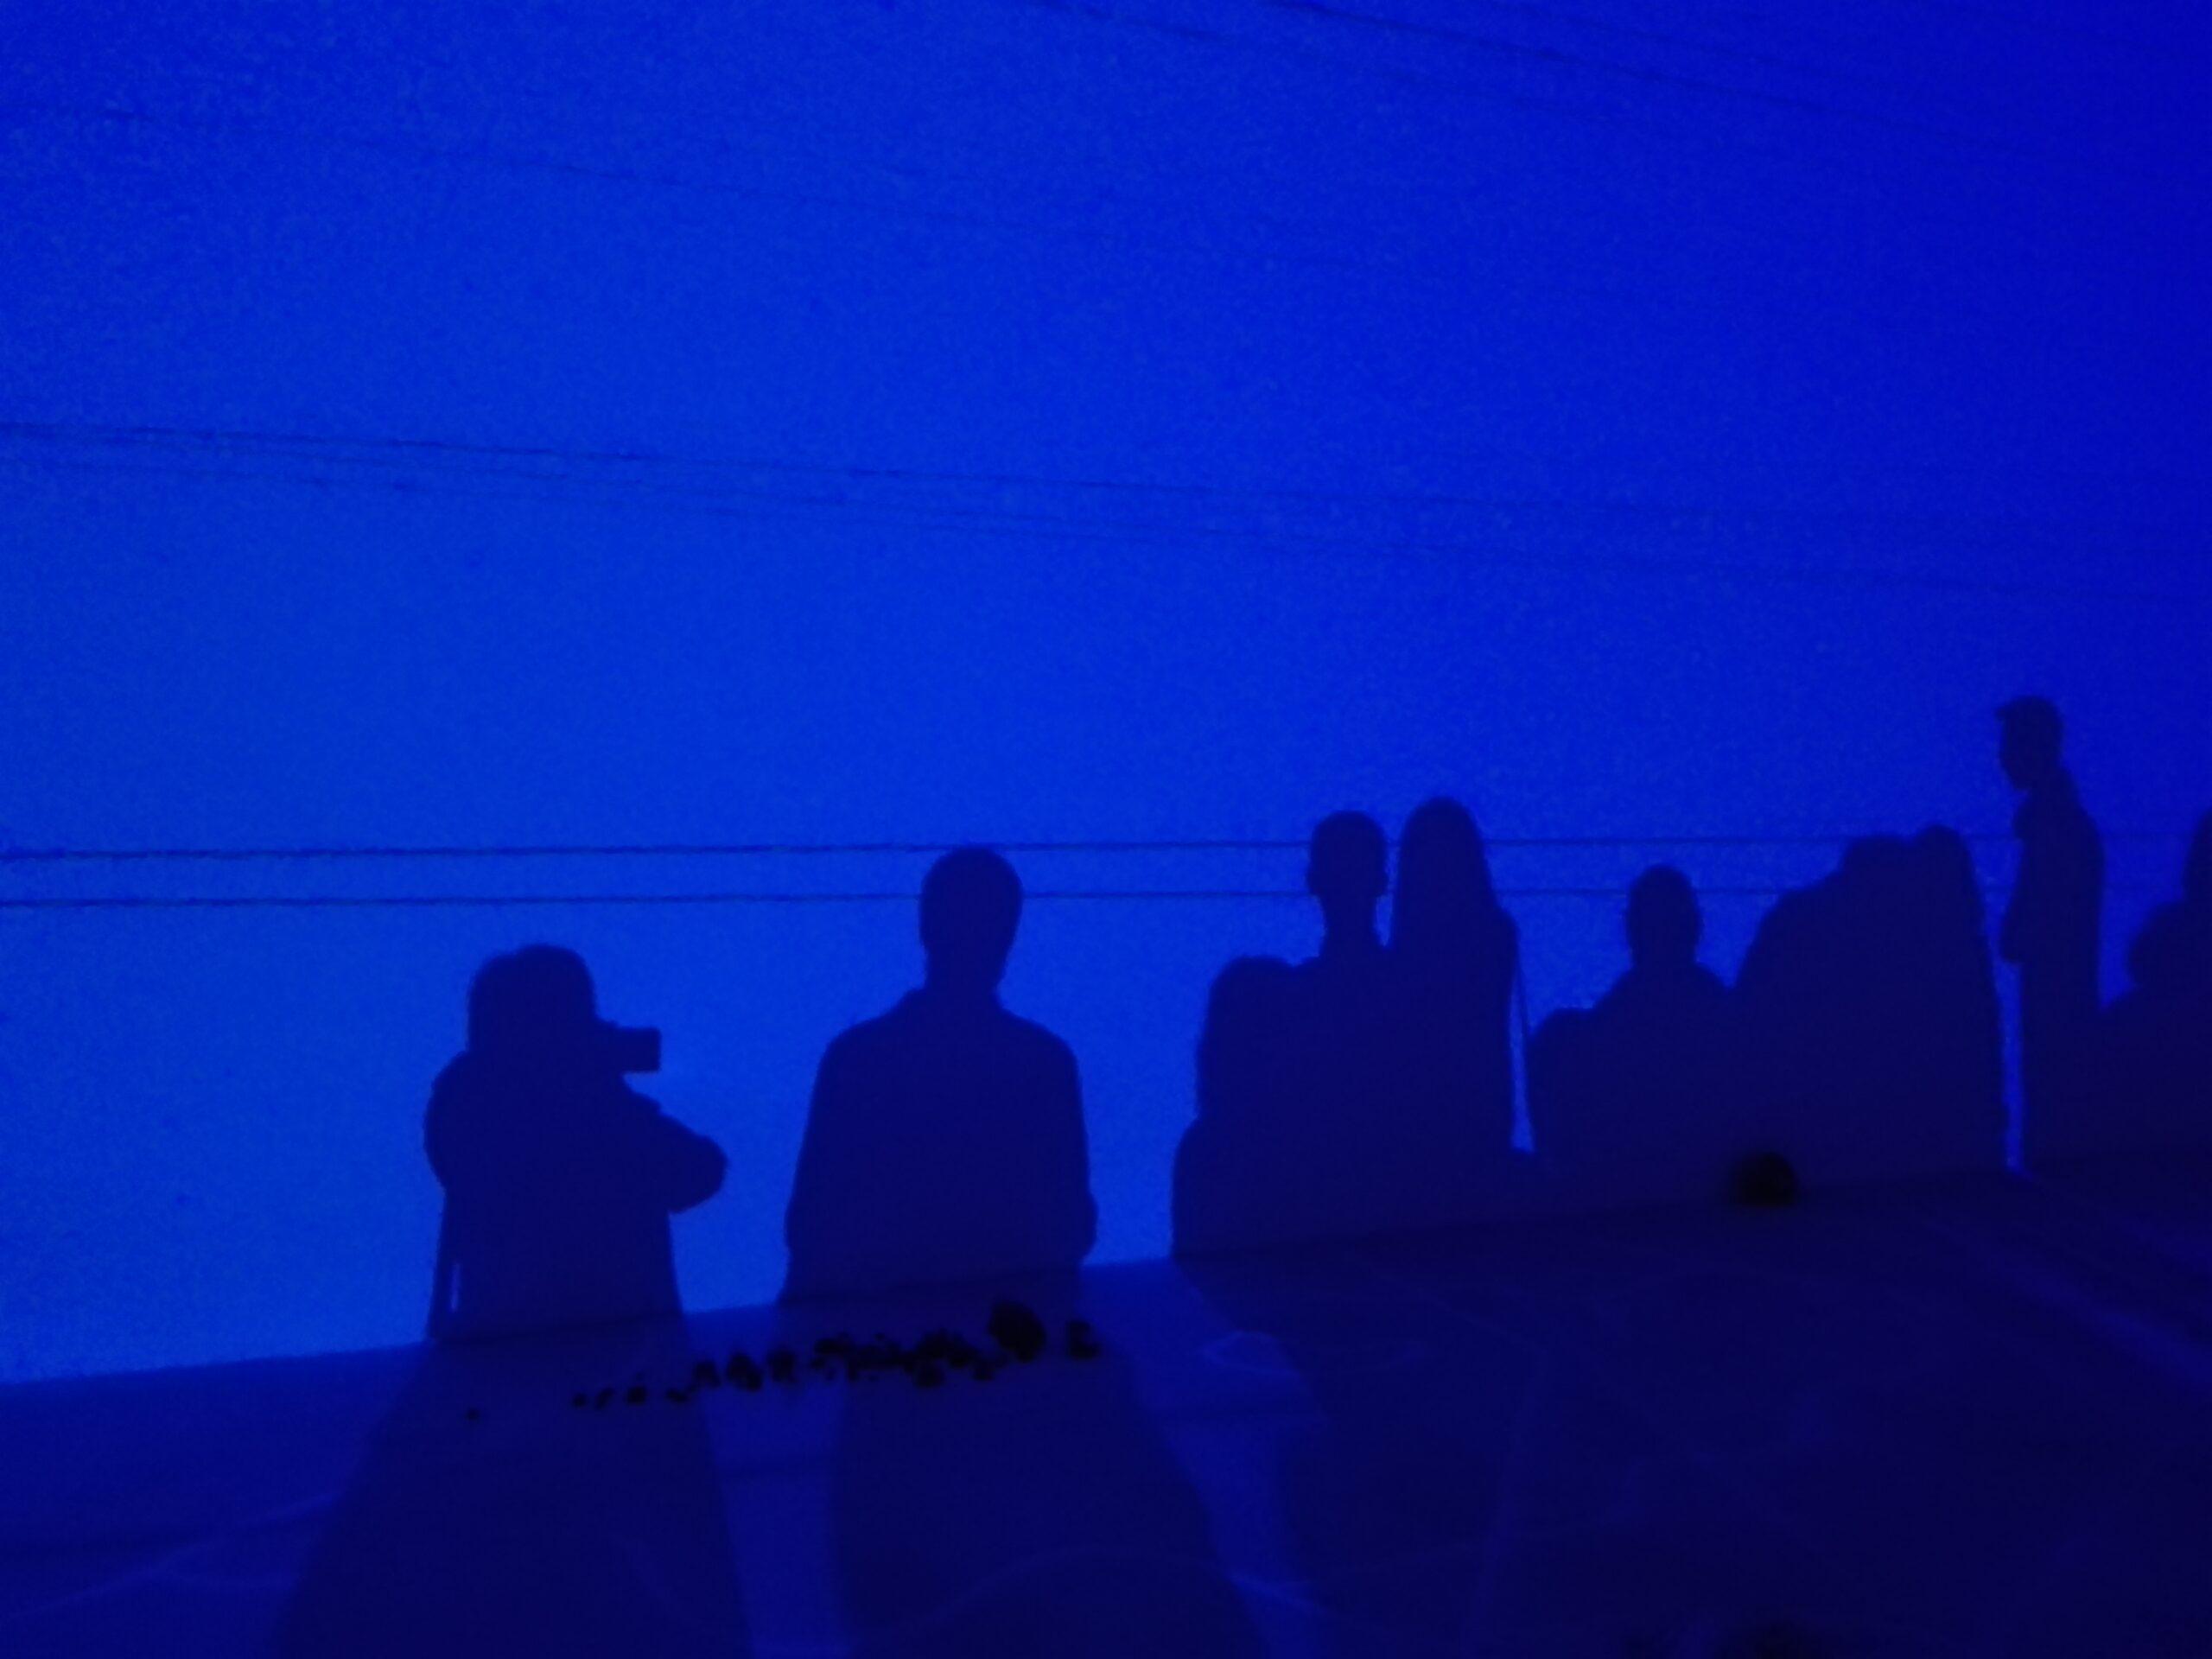 visita alla mostra Intimacies di MDR Intimacies presso Fondazione Brodbeck